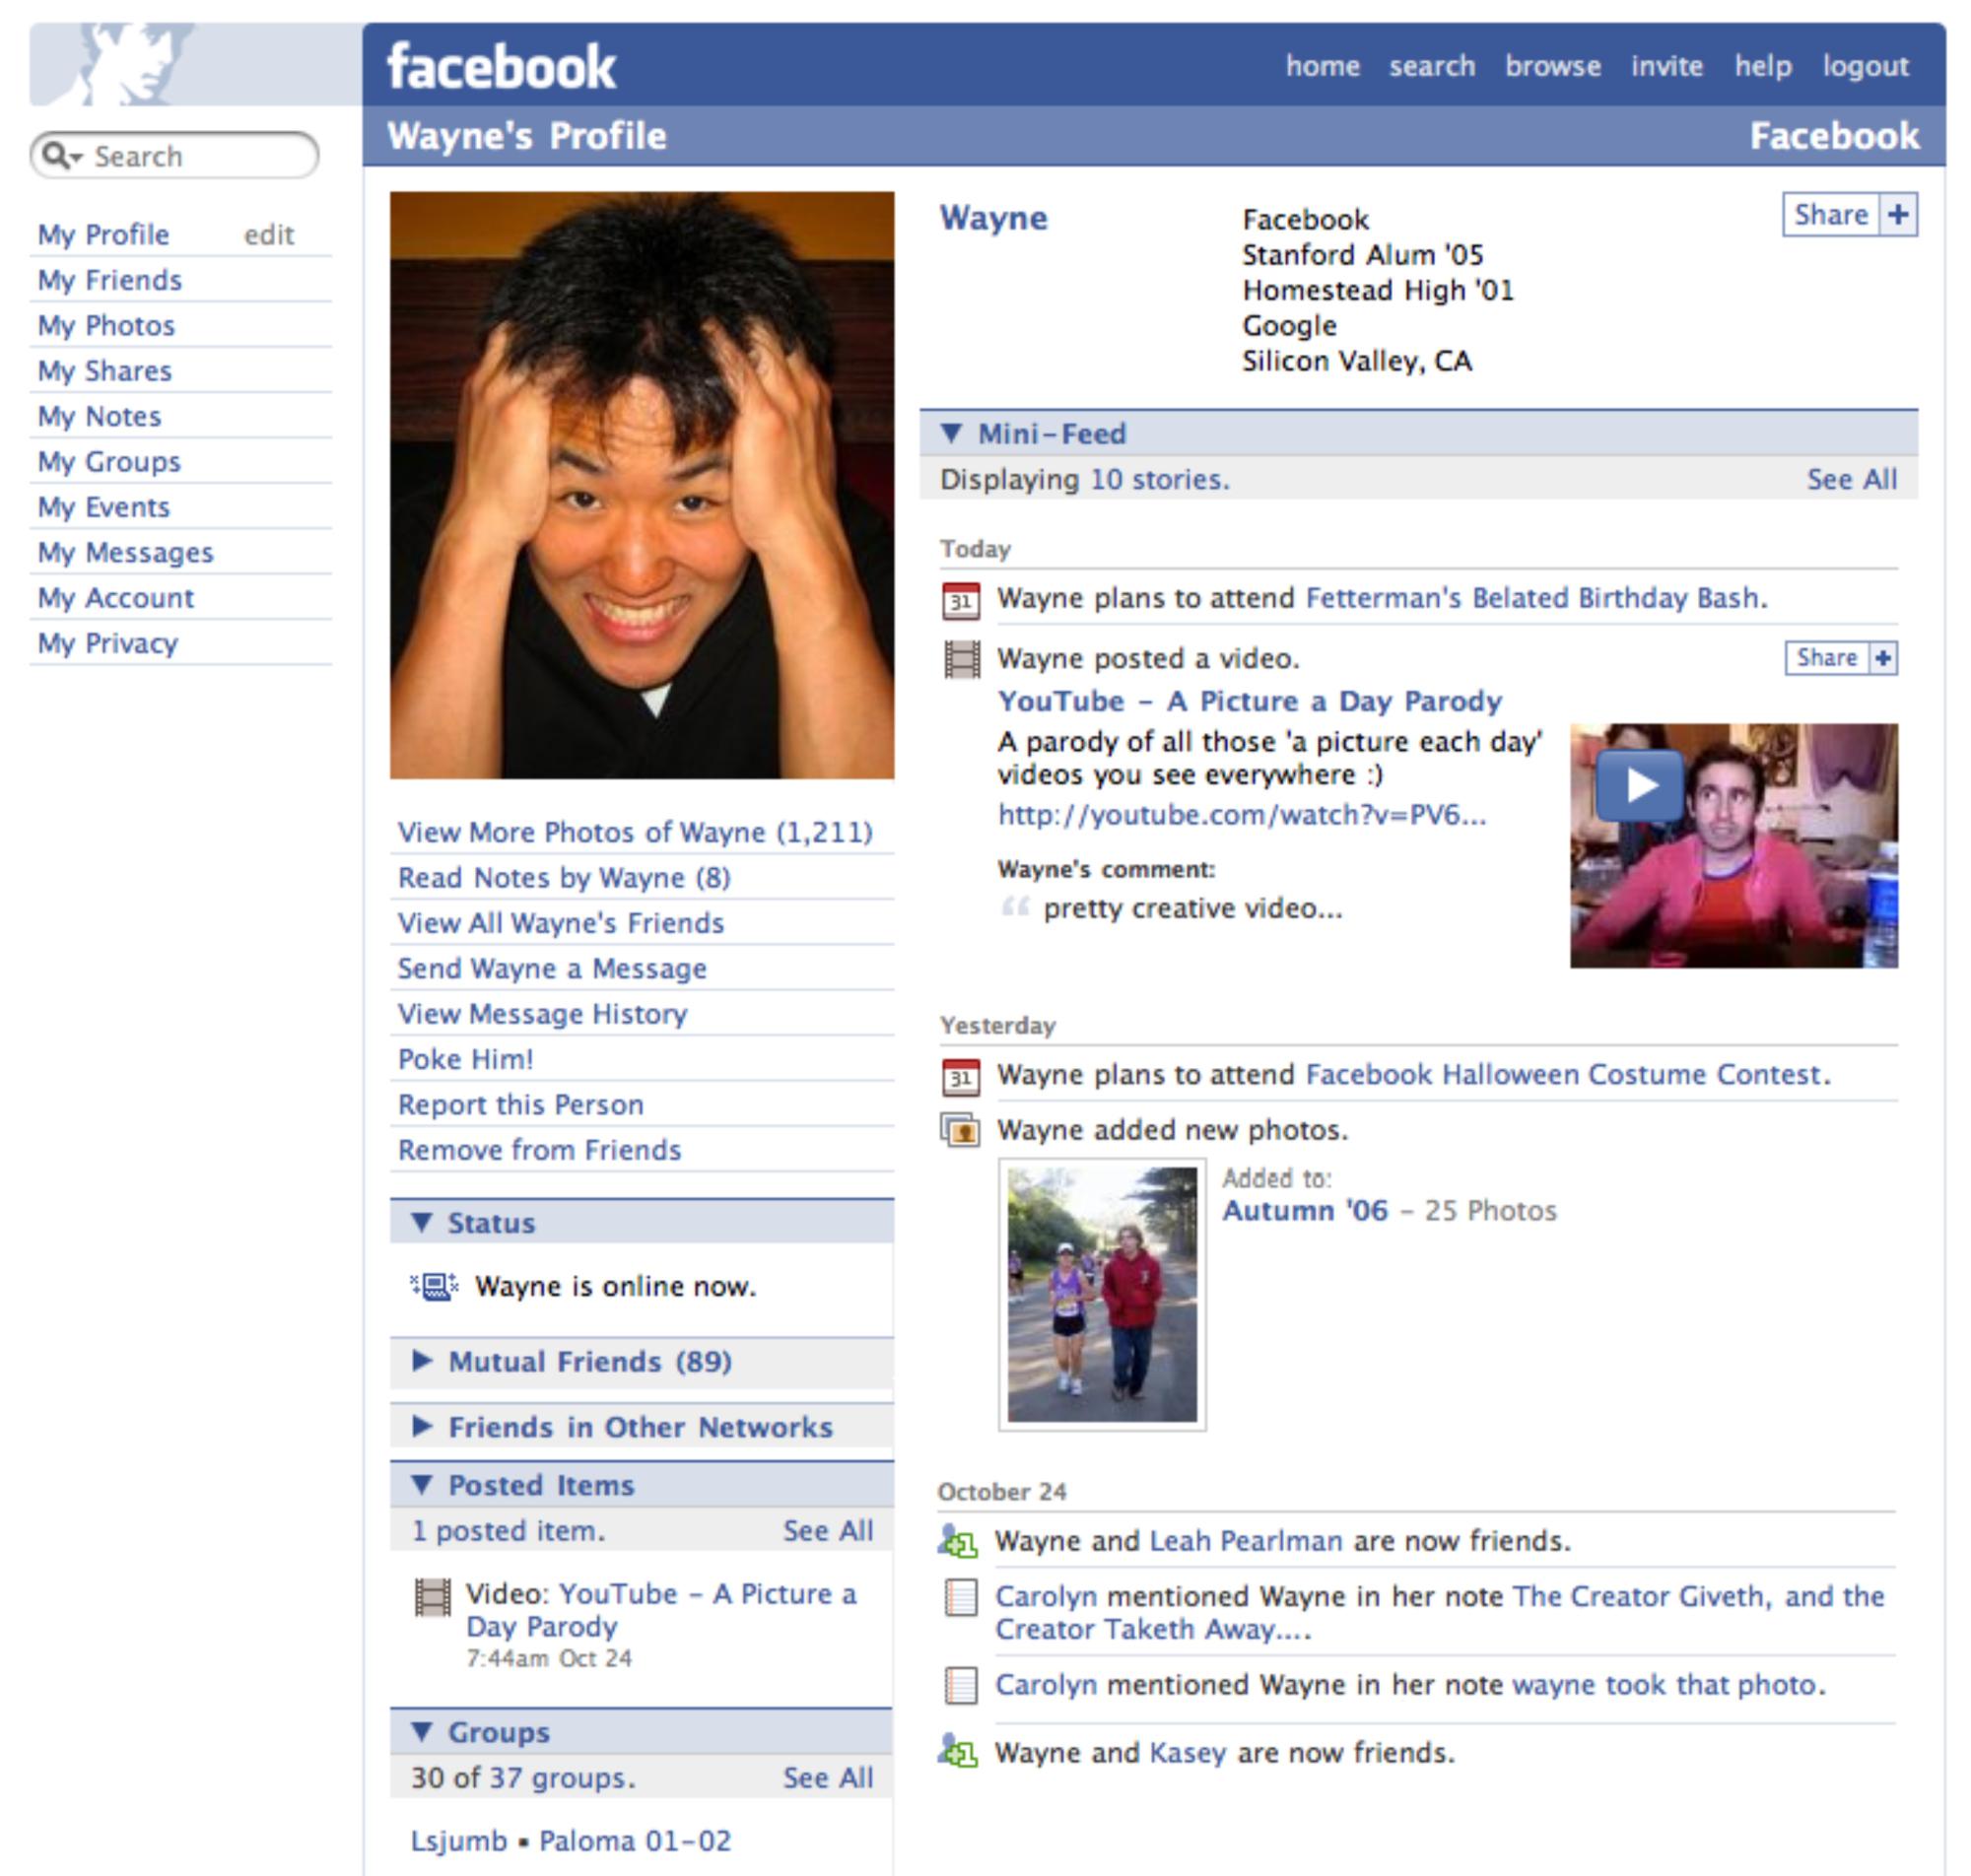 Wwwfacebook profile